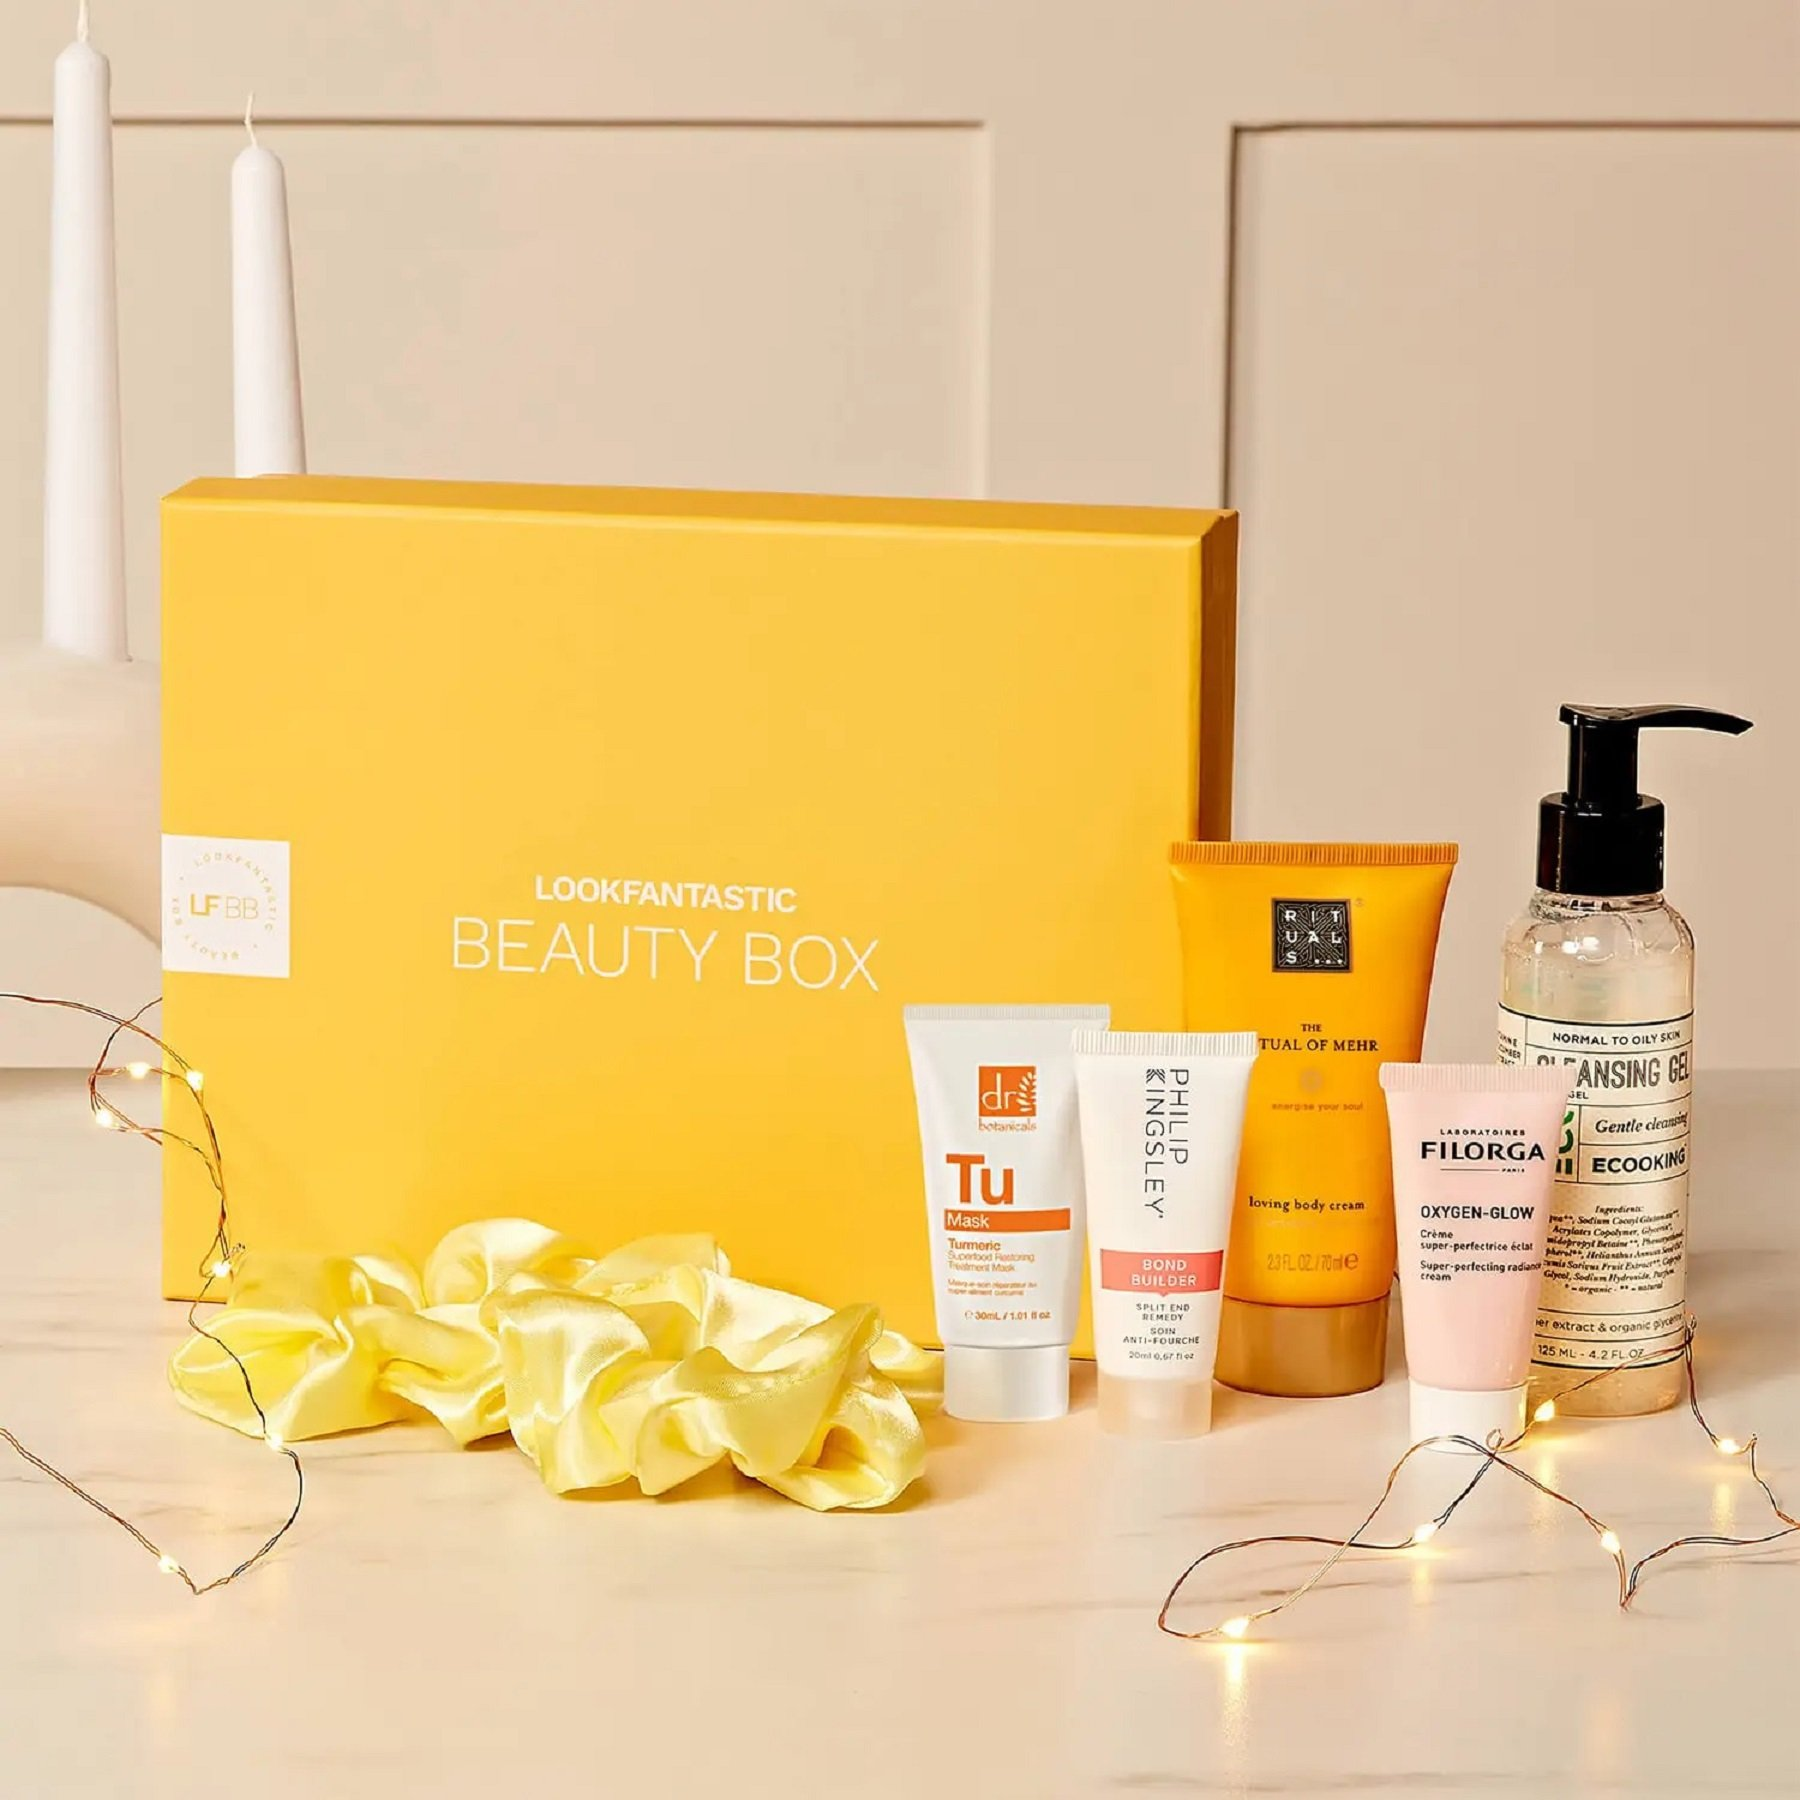 Discover October LOOKFANTASTIC Beauty Box